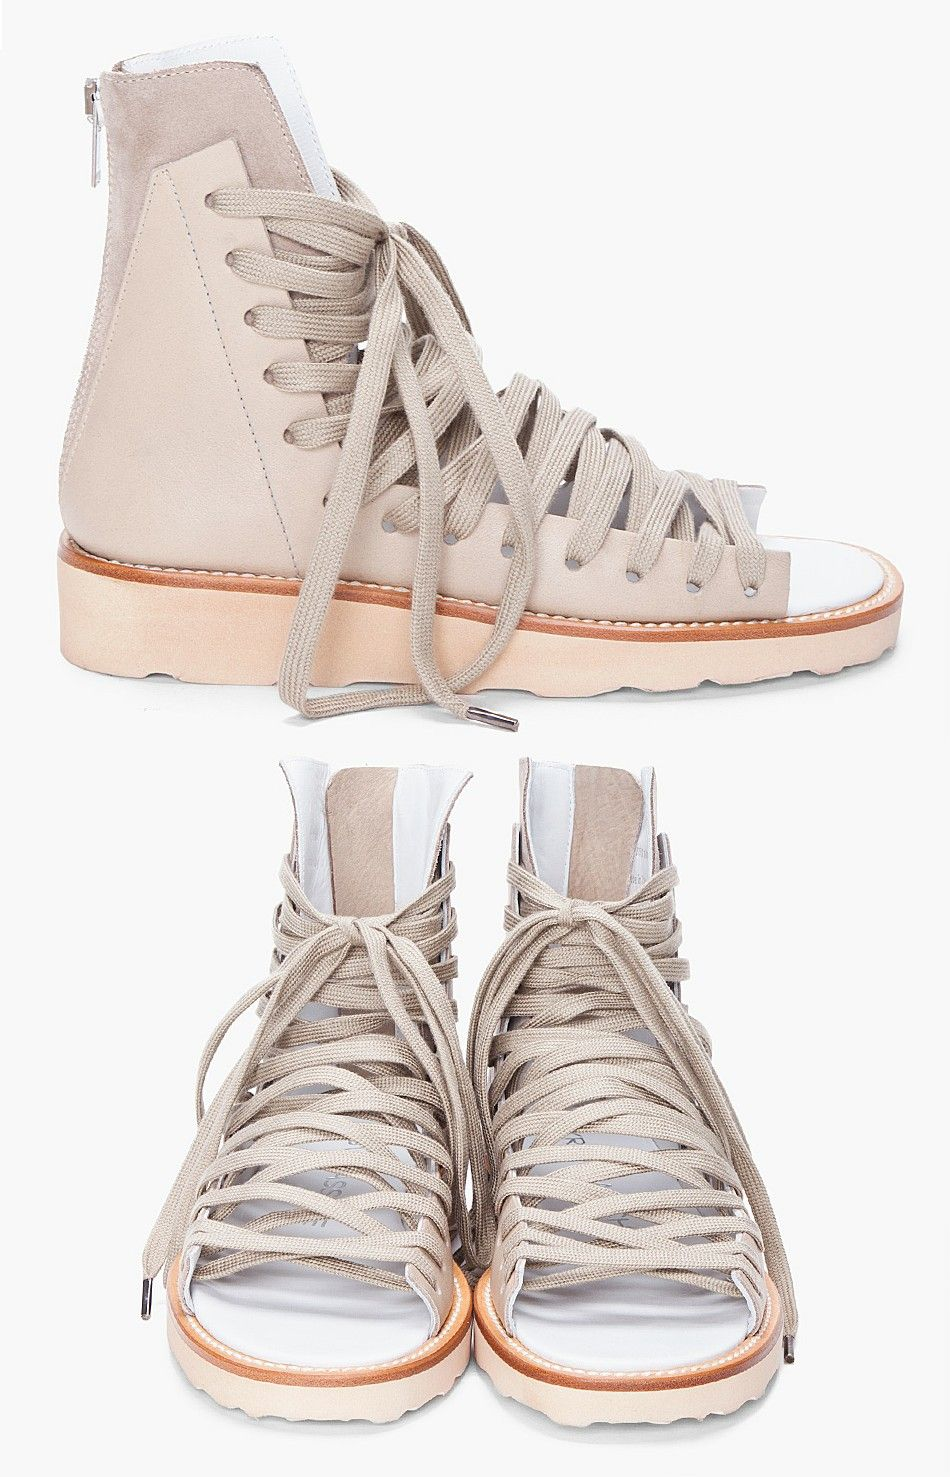 Chaussures Kva Assche Sandales Van Et 3 Kris Pinterest Les wAYRnqp